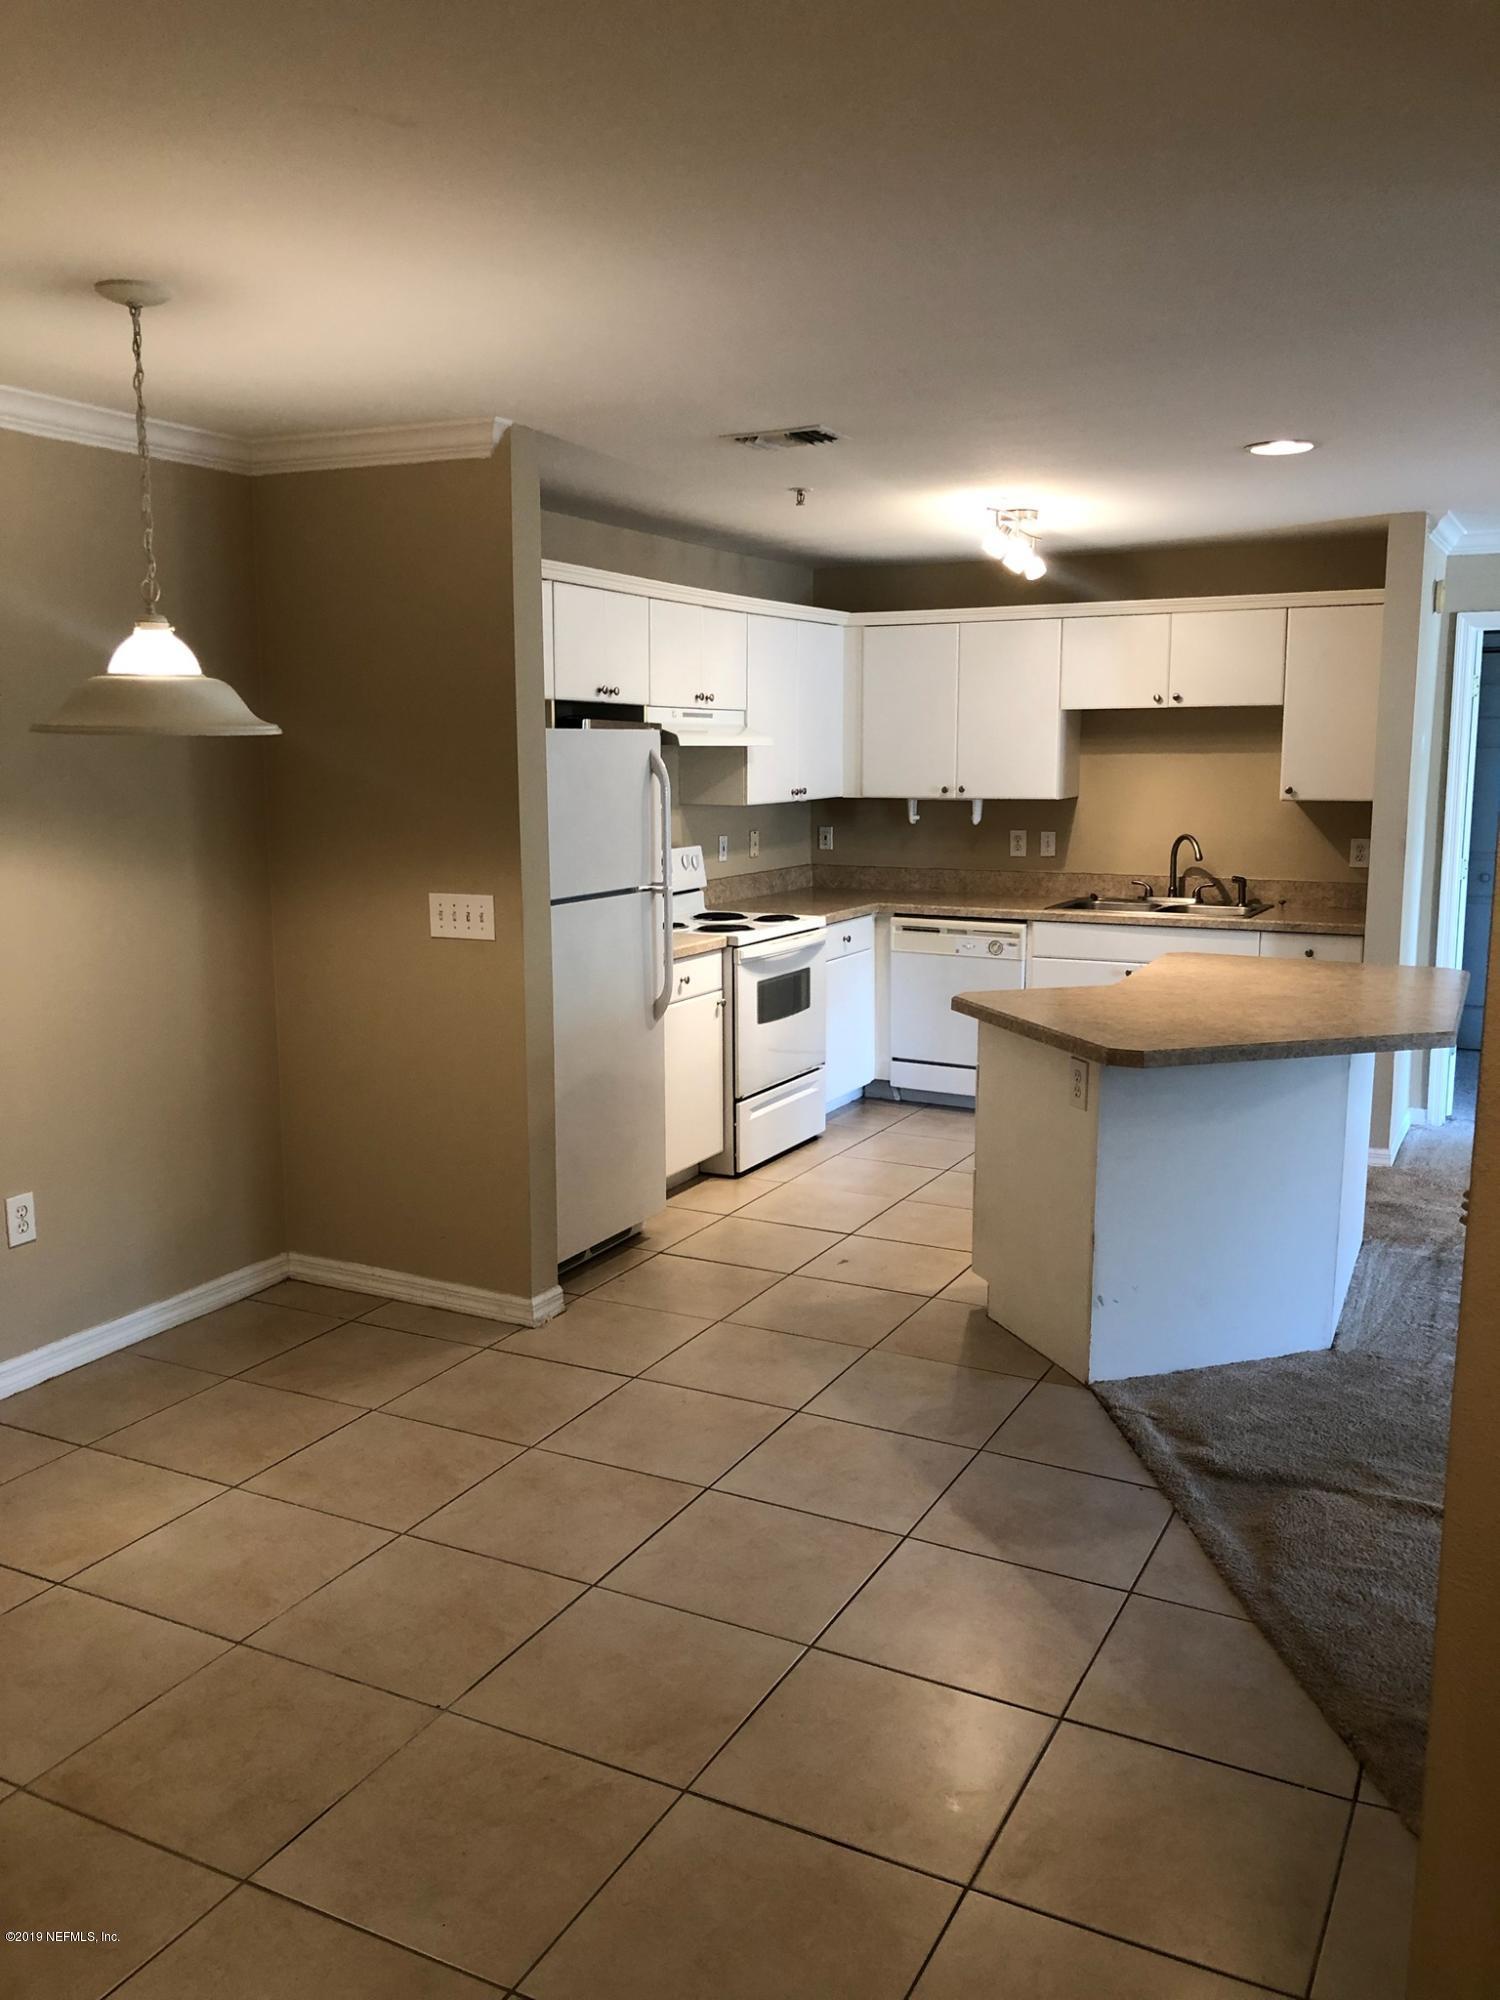 3591 KERNAN- JACKSONVILLE- FLORIDA 32224, 2 Bedrooms Bedrooms, ,2 BathroomsBathrooms,Condo,For sale,KERNAN,993776